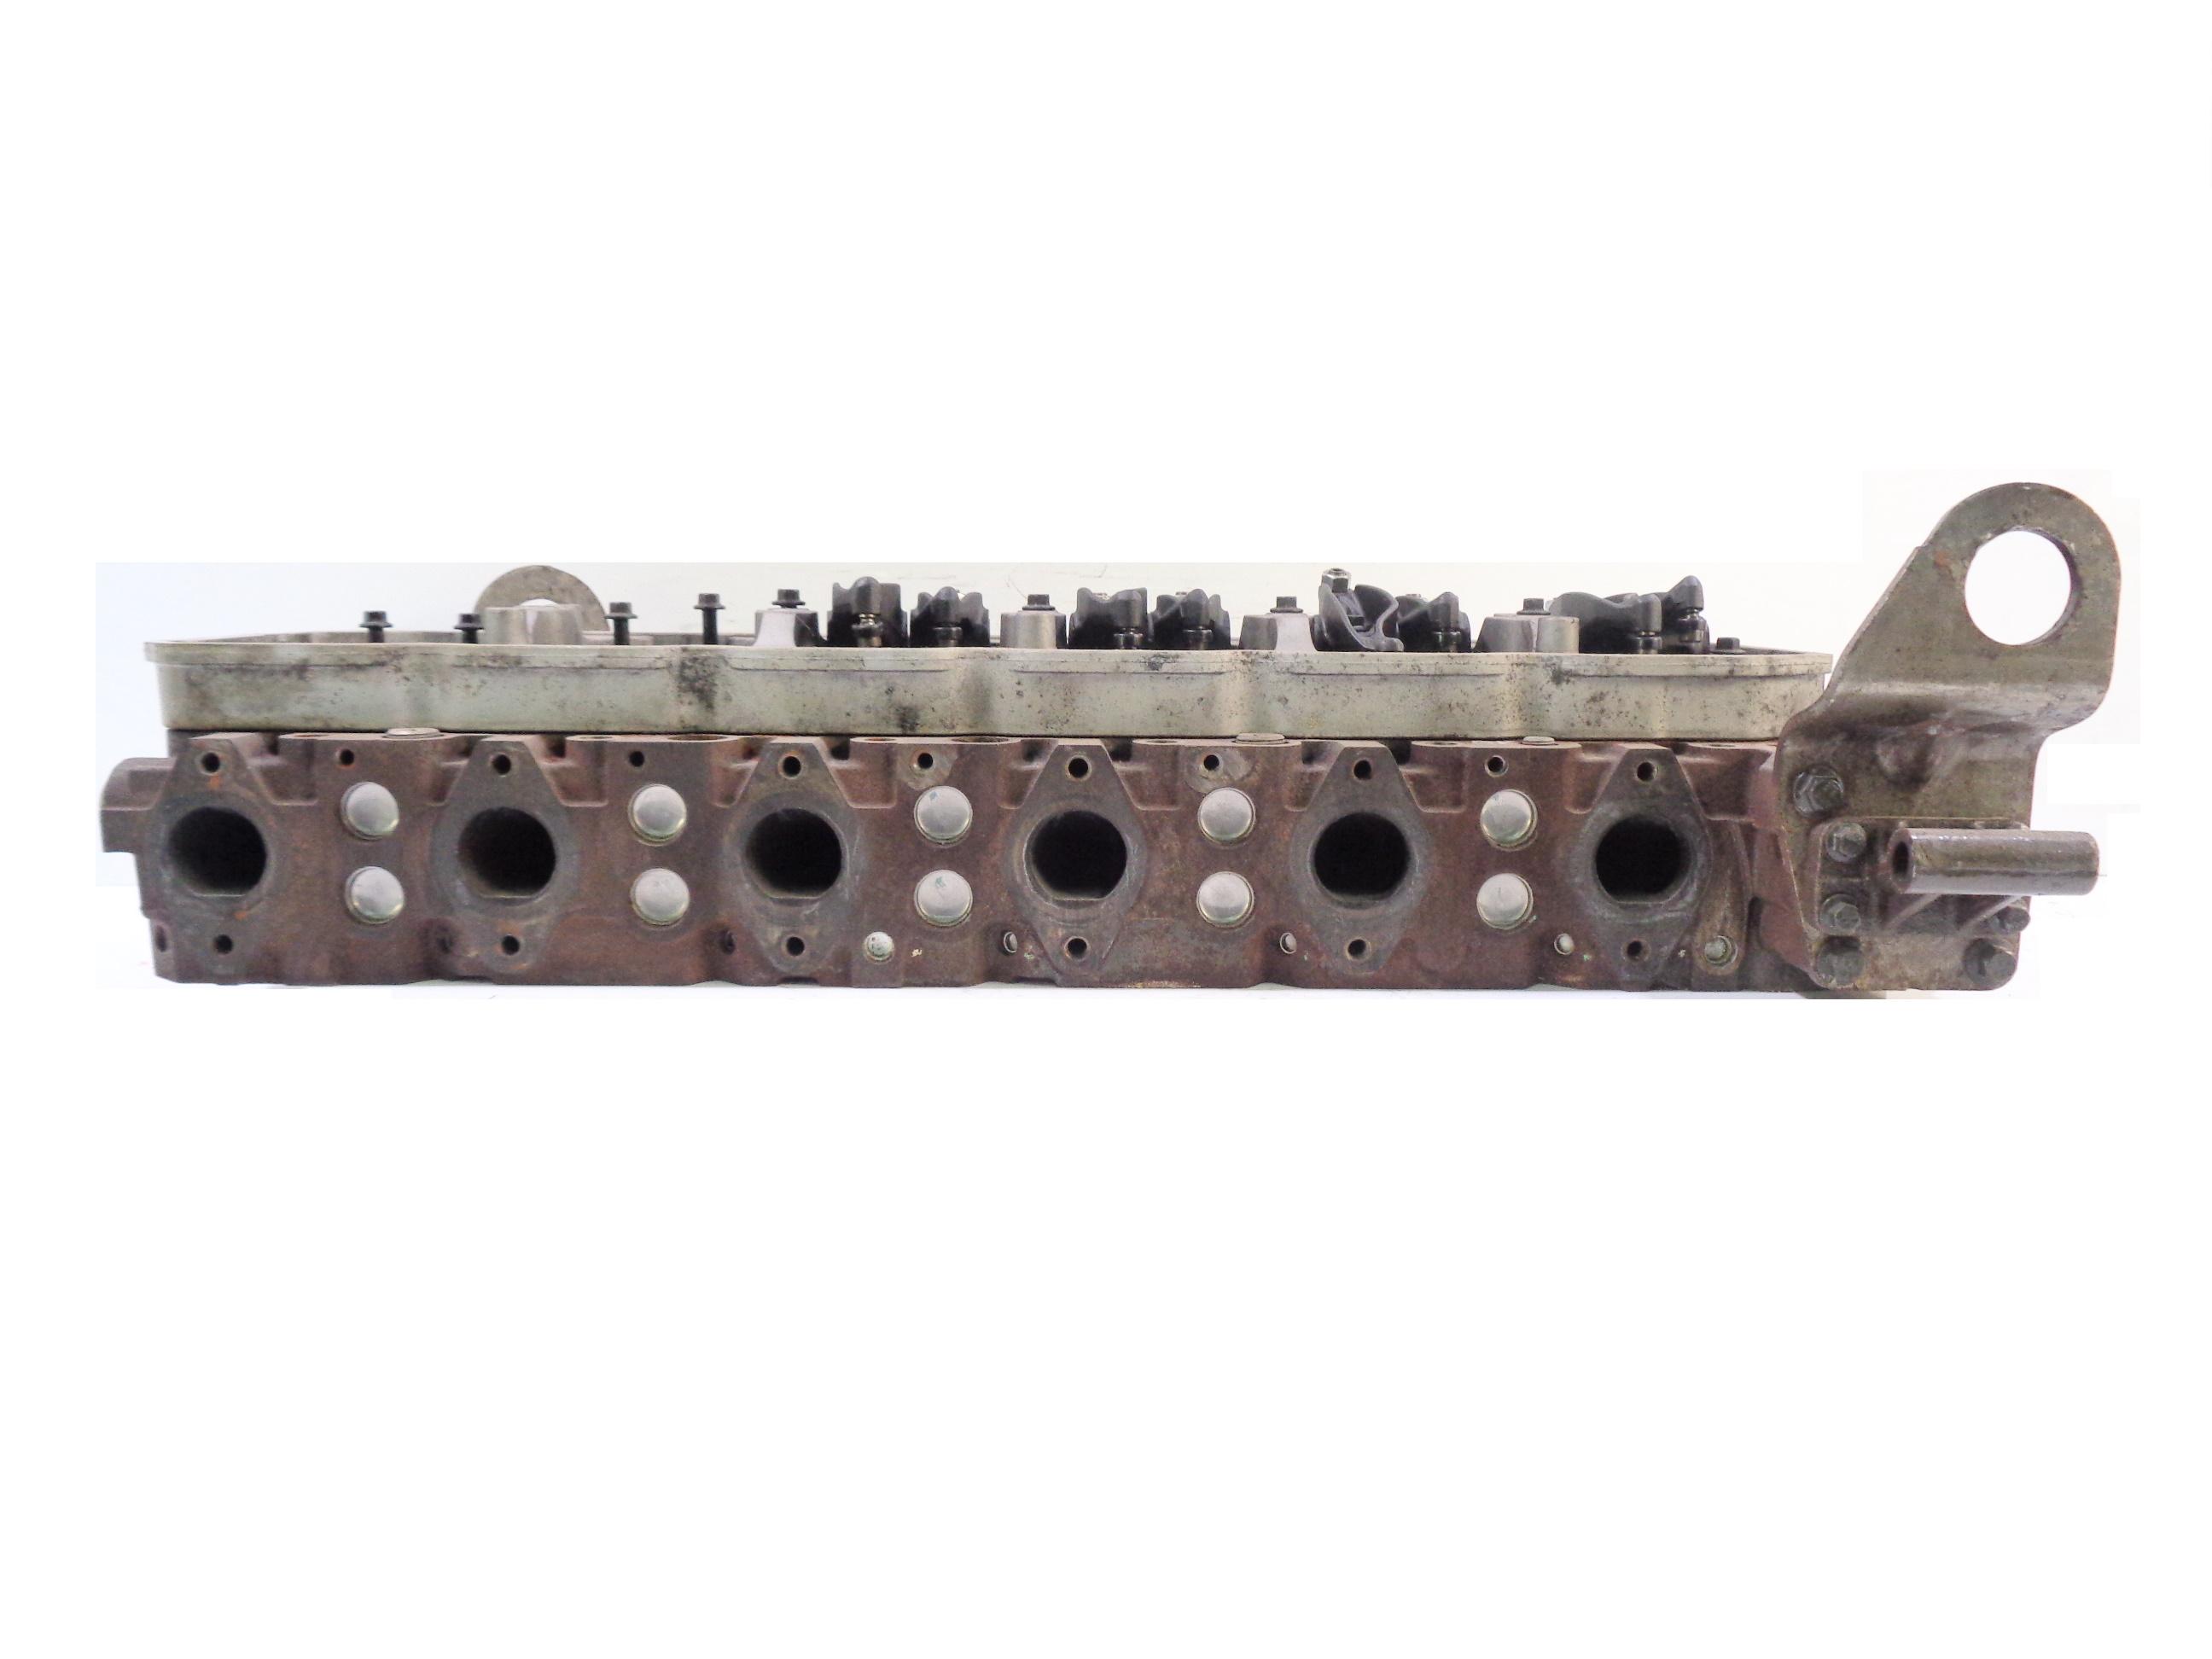 Testa cilindro Dodge Ram 4000 6,7 D 224 KW 305 CV